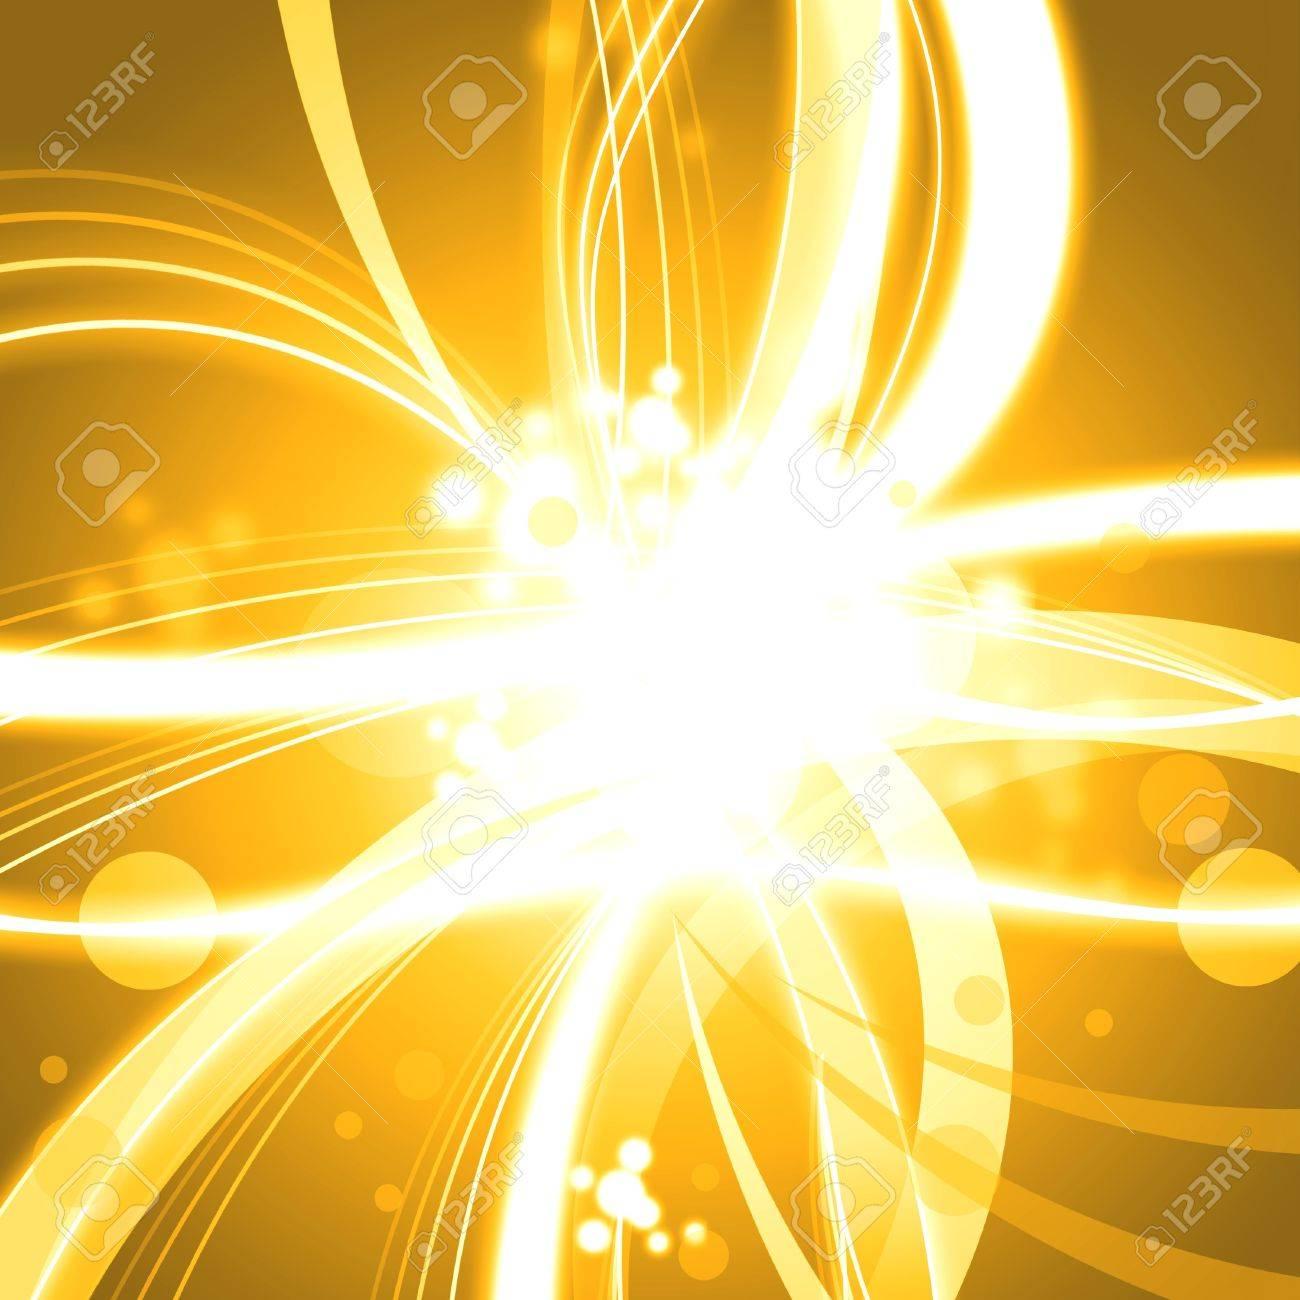 Golden shine abstract background illustration Stock Photo - 14619517